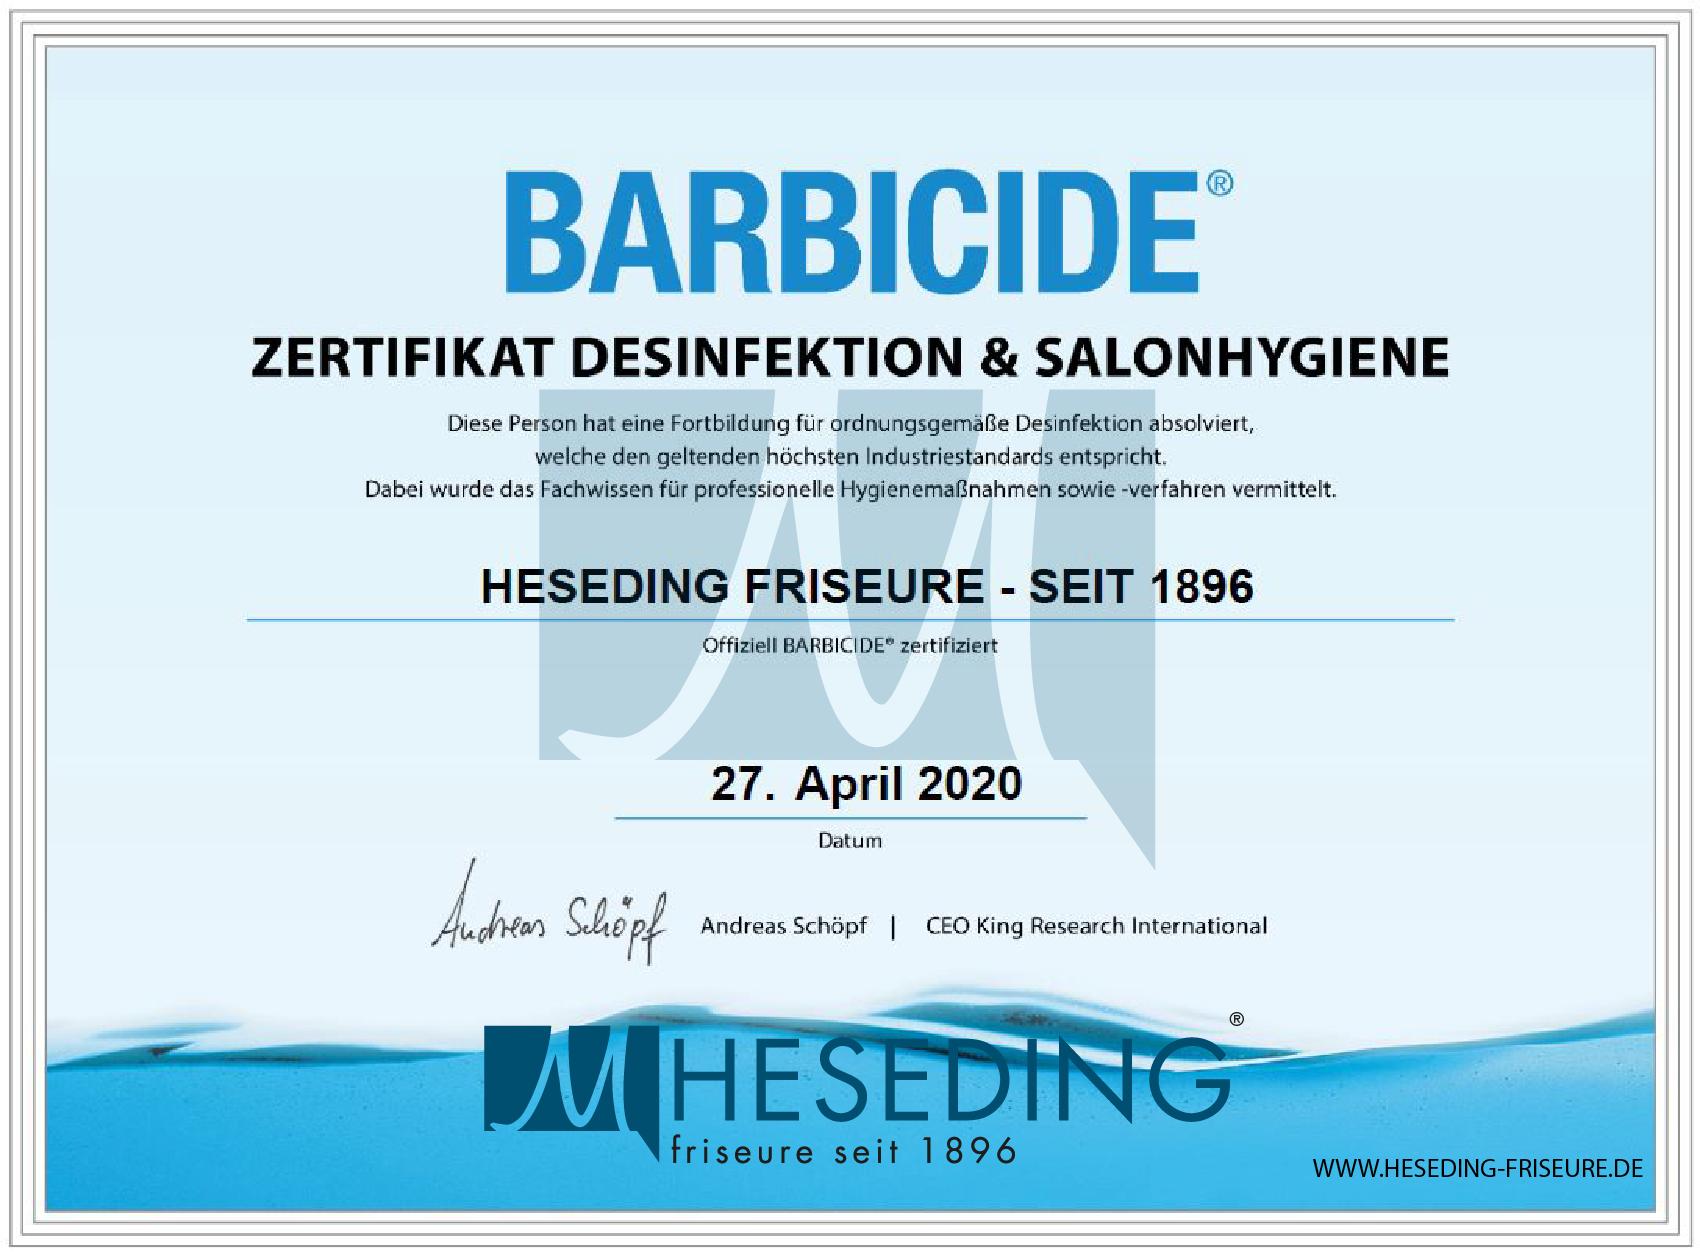 Hygienezertifikat Friseursalon Lohne Heseding Friseure